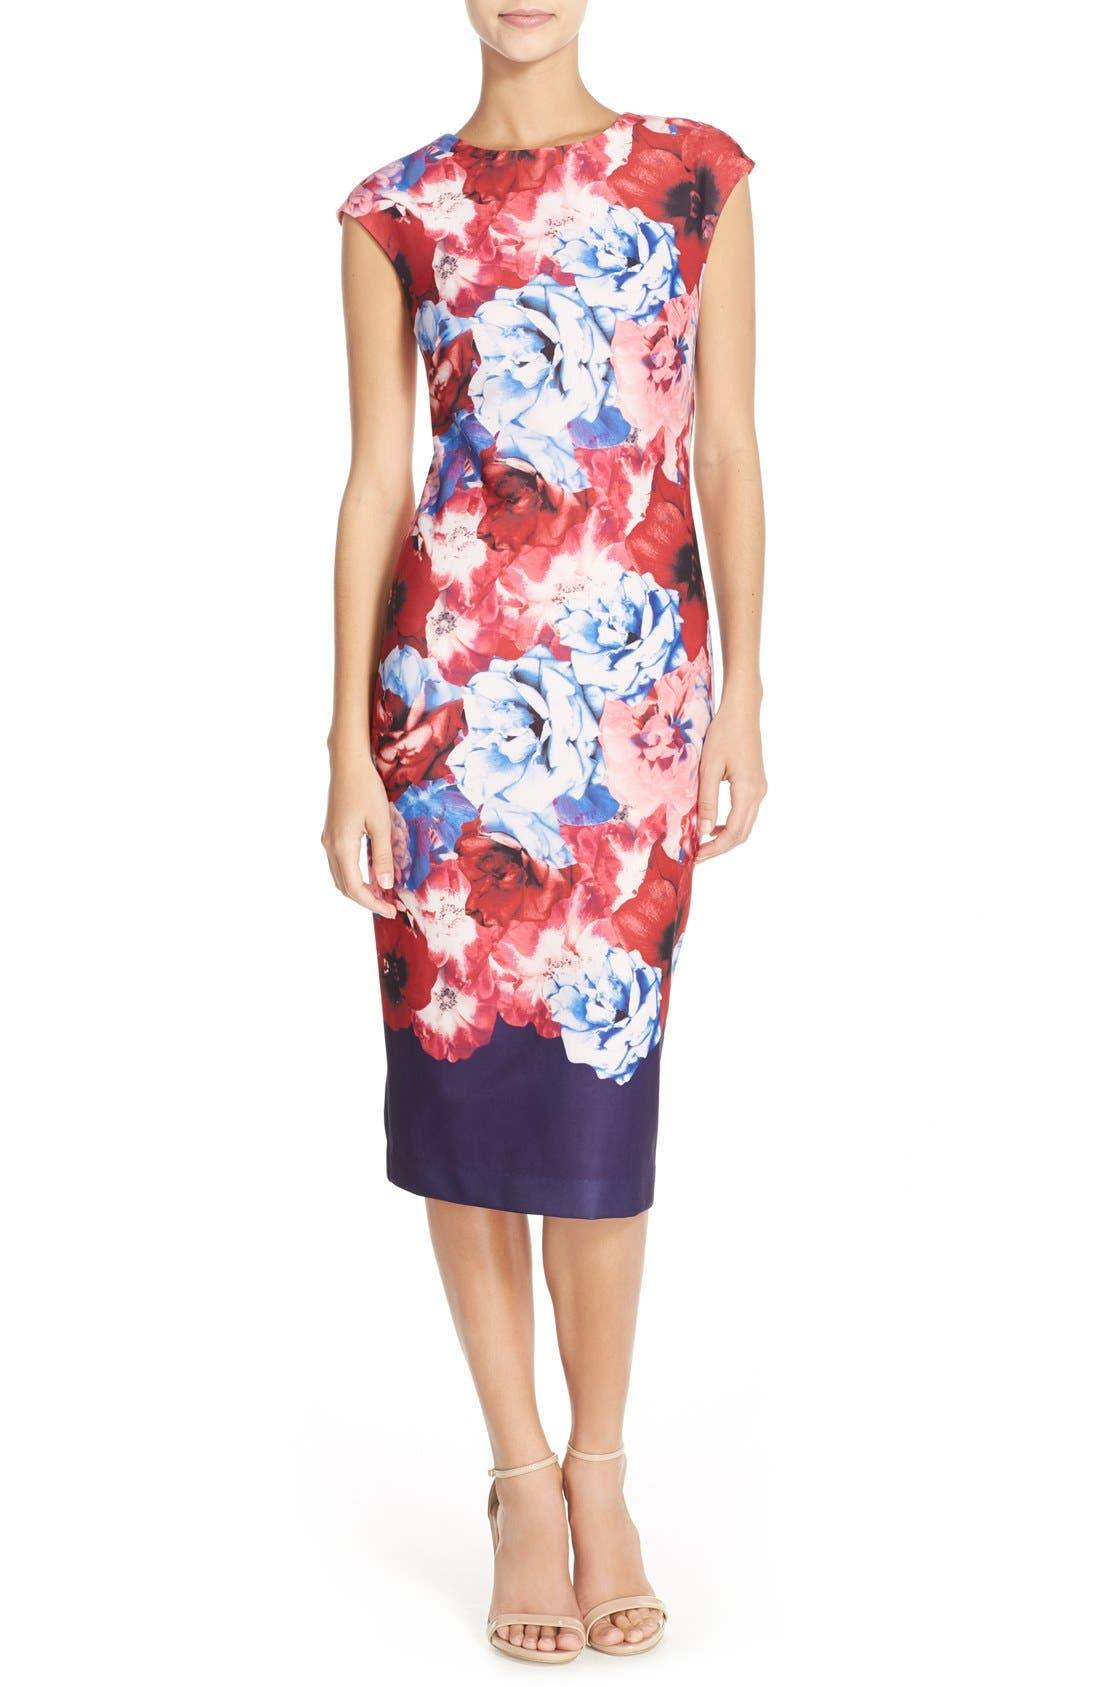 Main Image - Vince Camuto Floral Print Stretch Midi Dress (Regular & Petite)